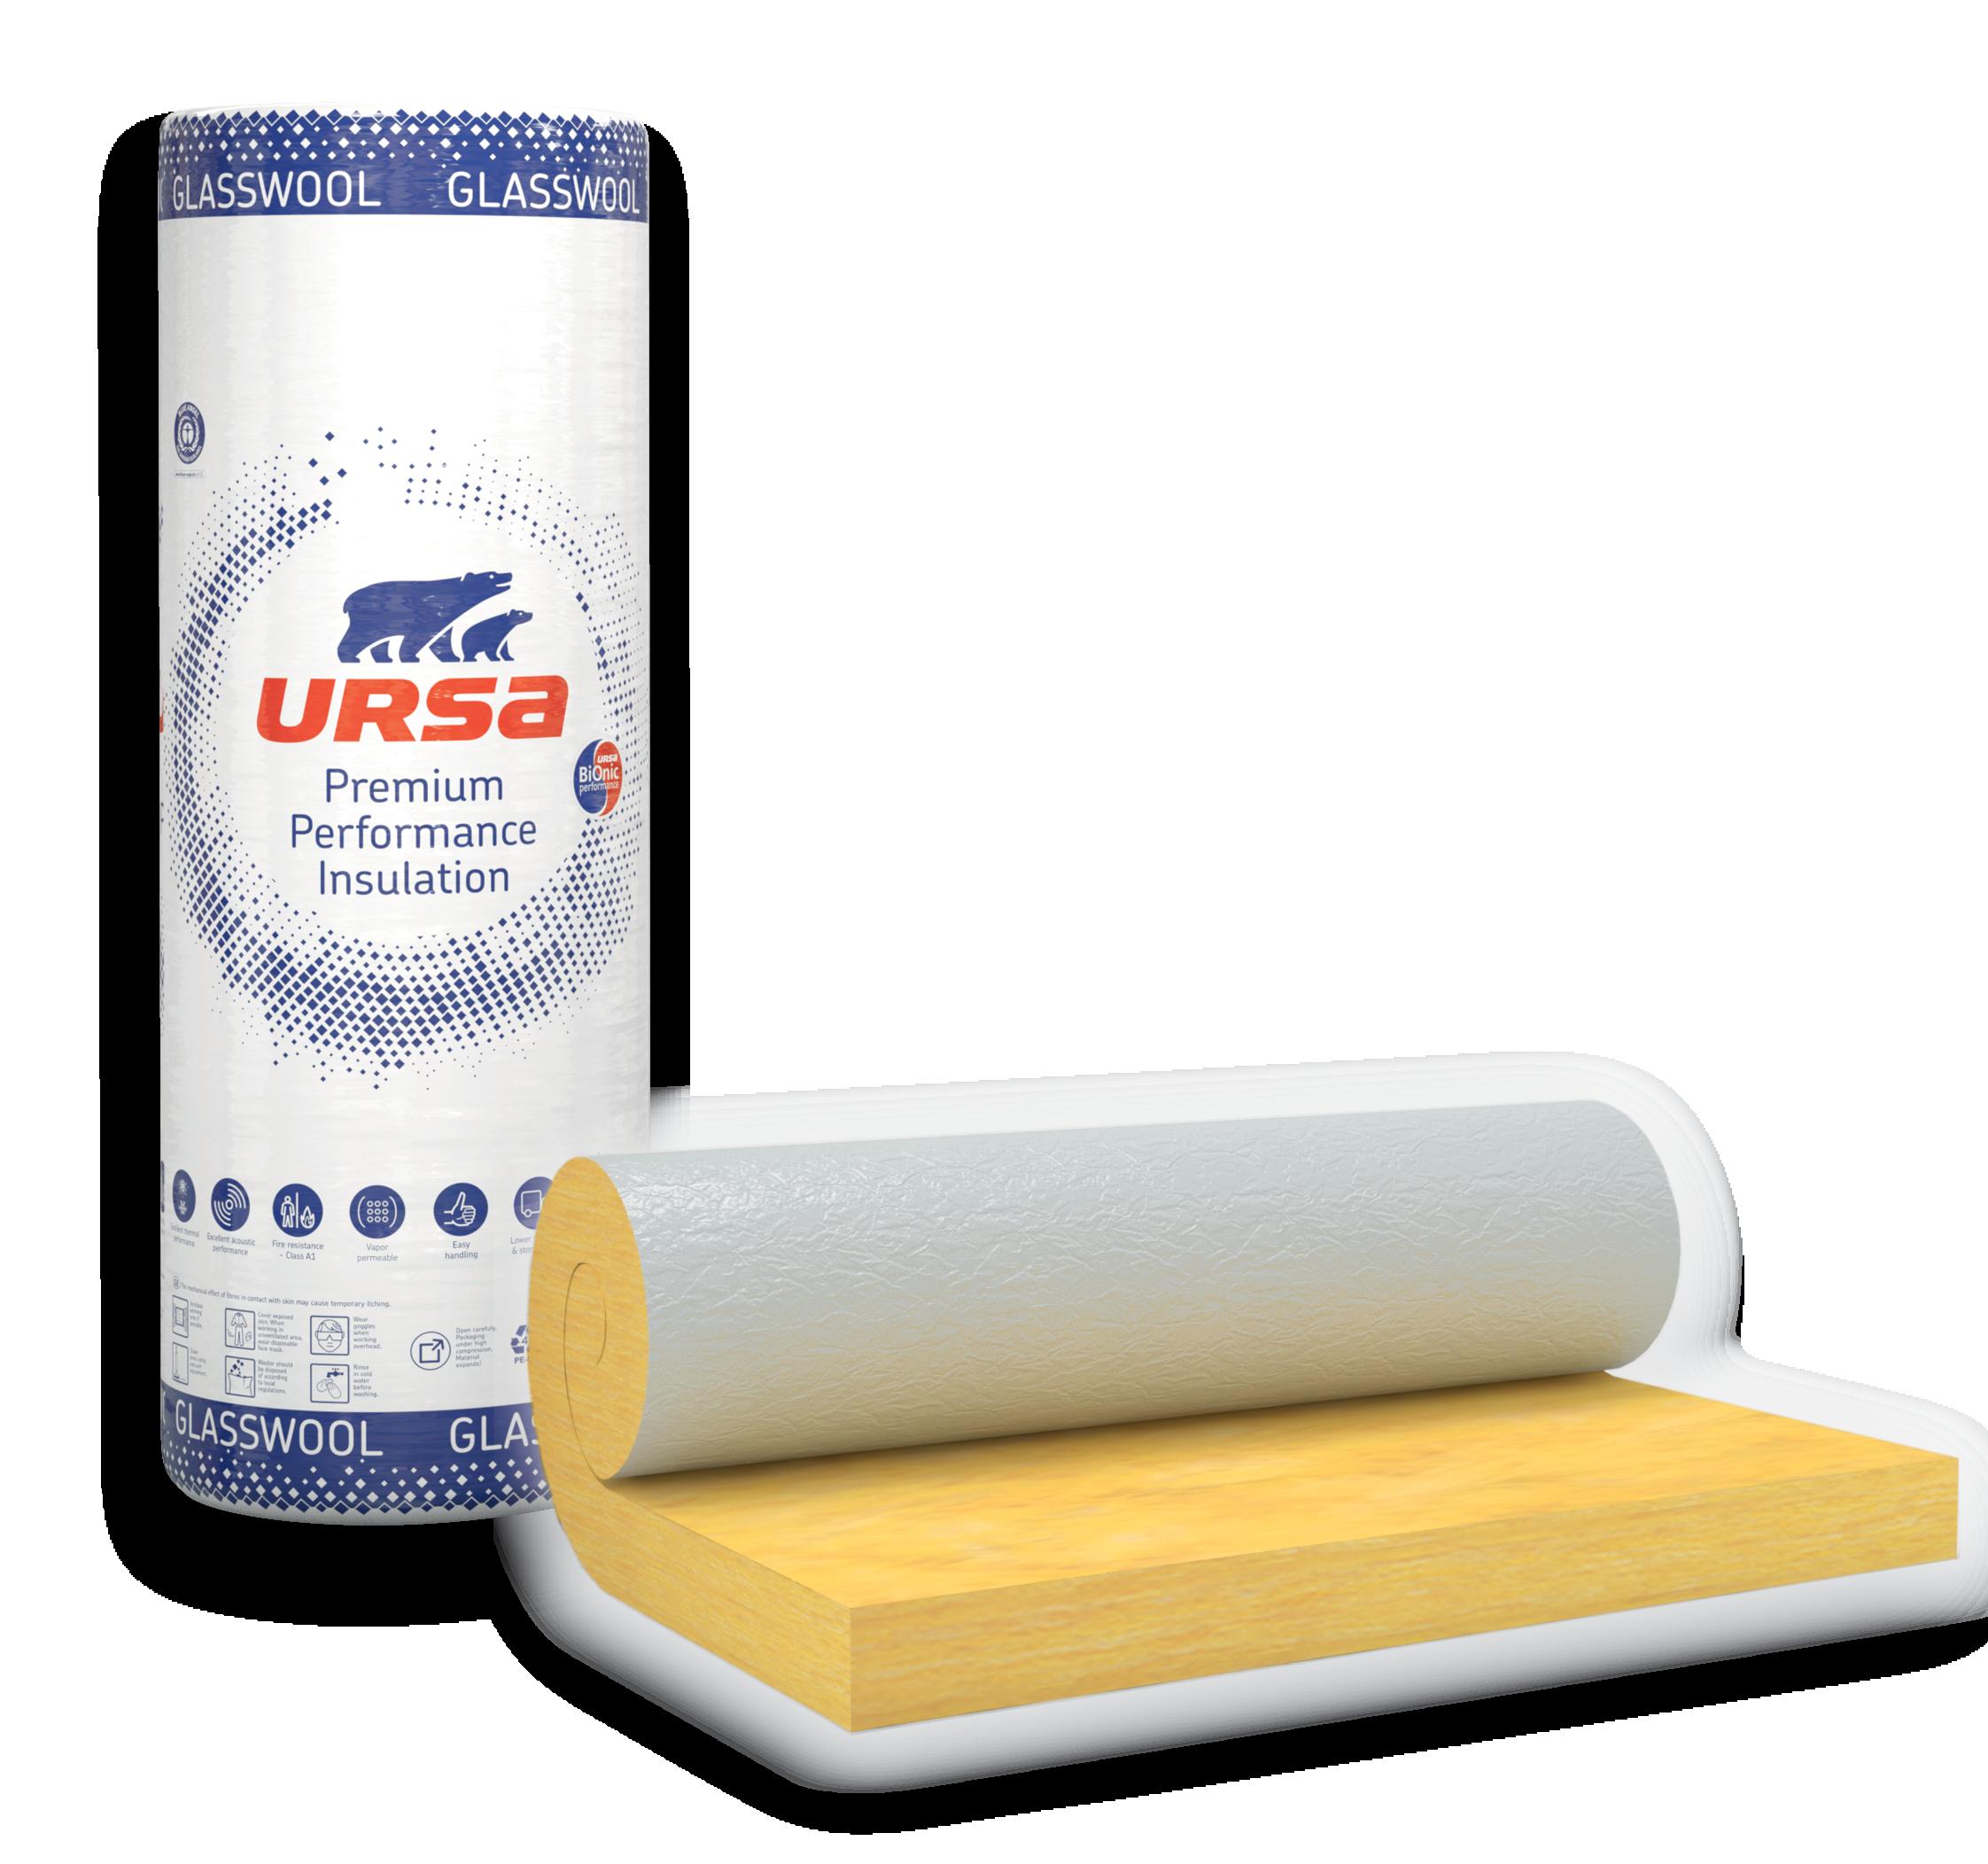 ursa-df40ab-1526994930.png